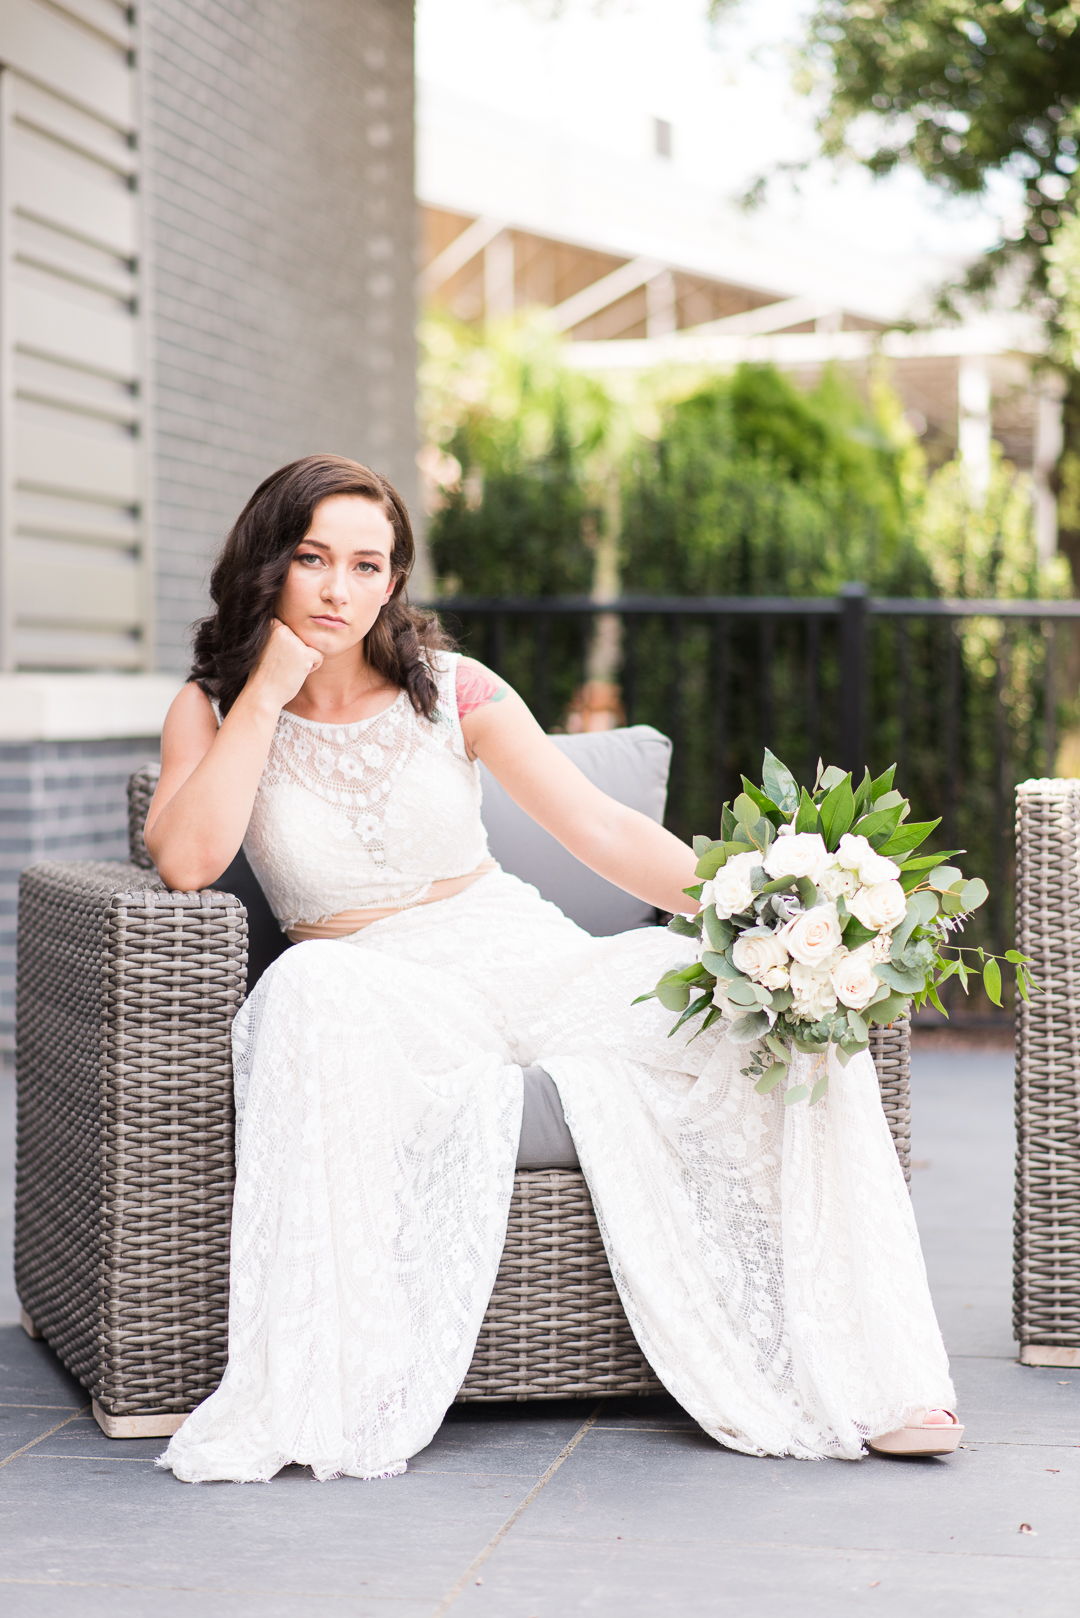 Bride in Wedding Jumpsuit